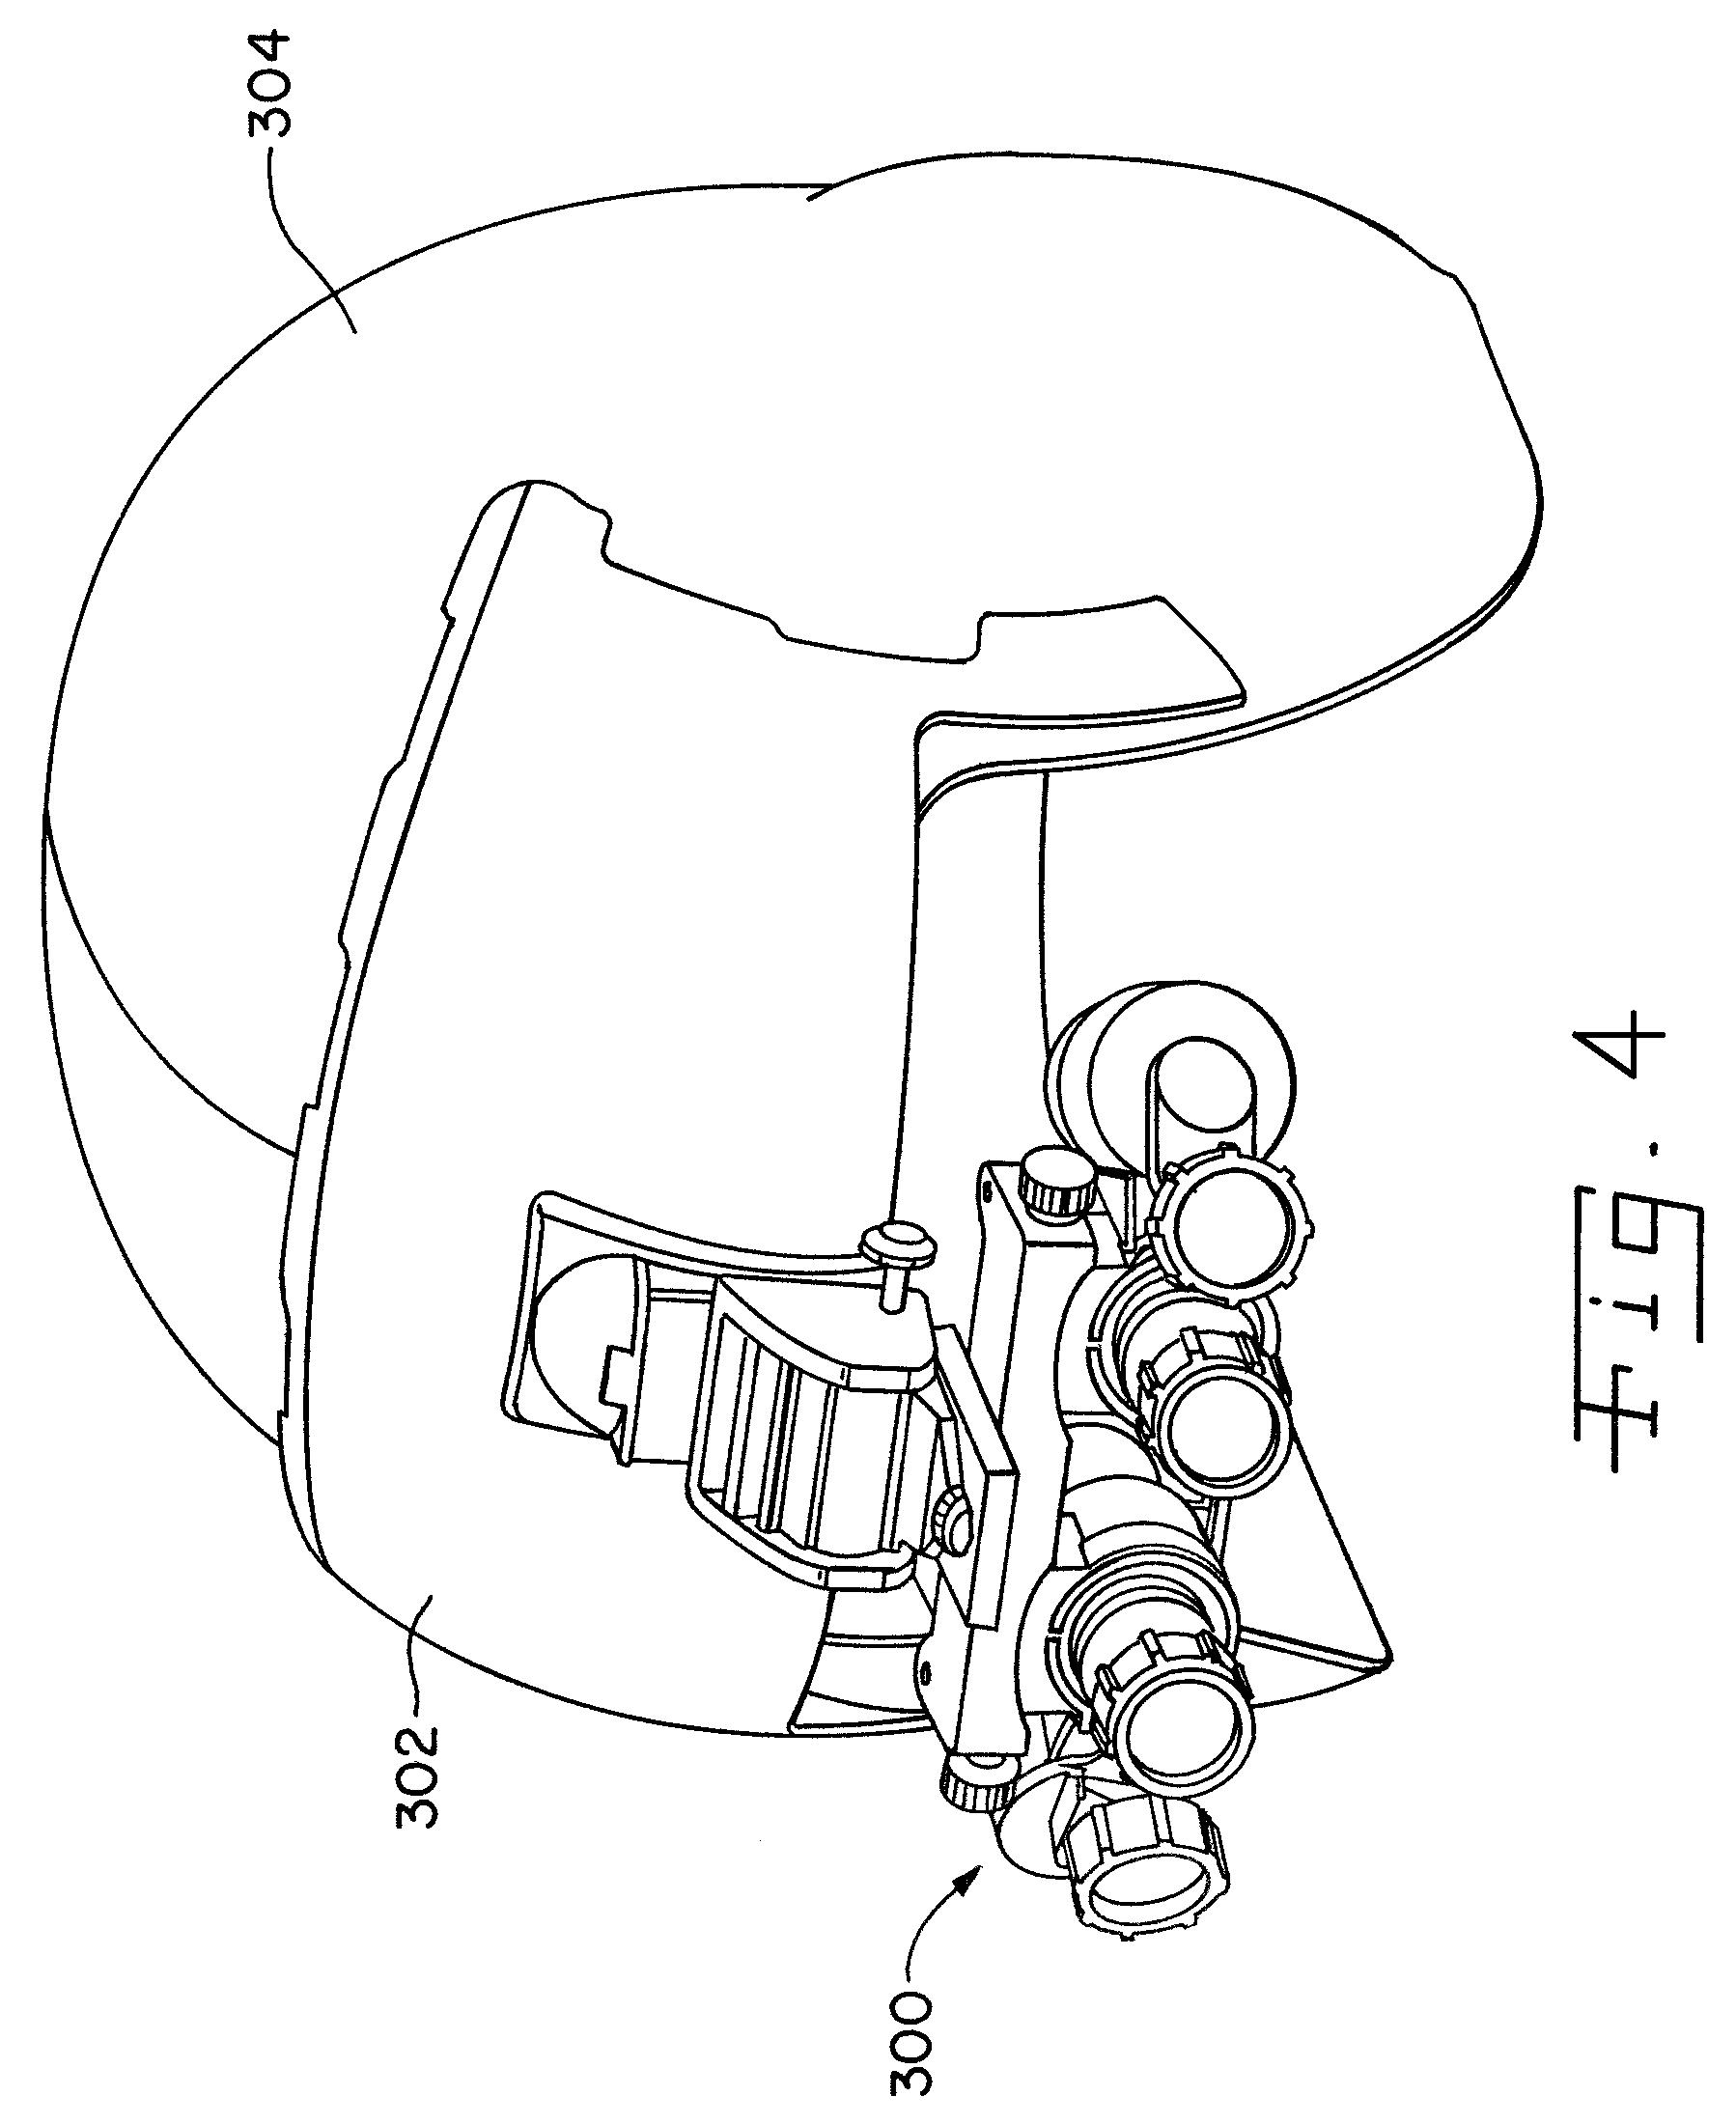 Suzuki 250 atv diagram wiring mazda 3 wiper wiring diagram